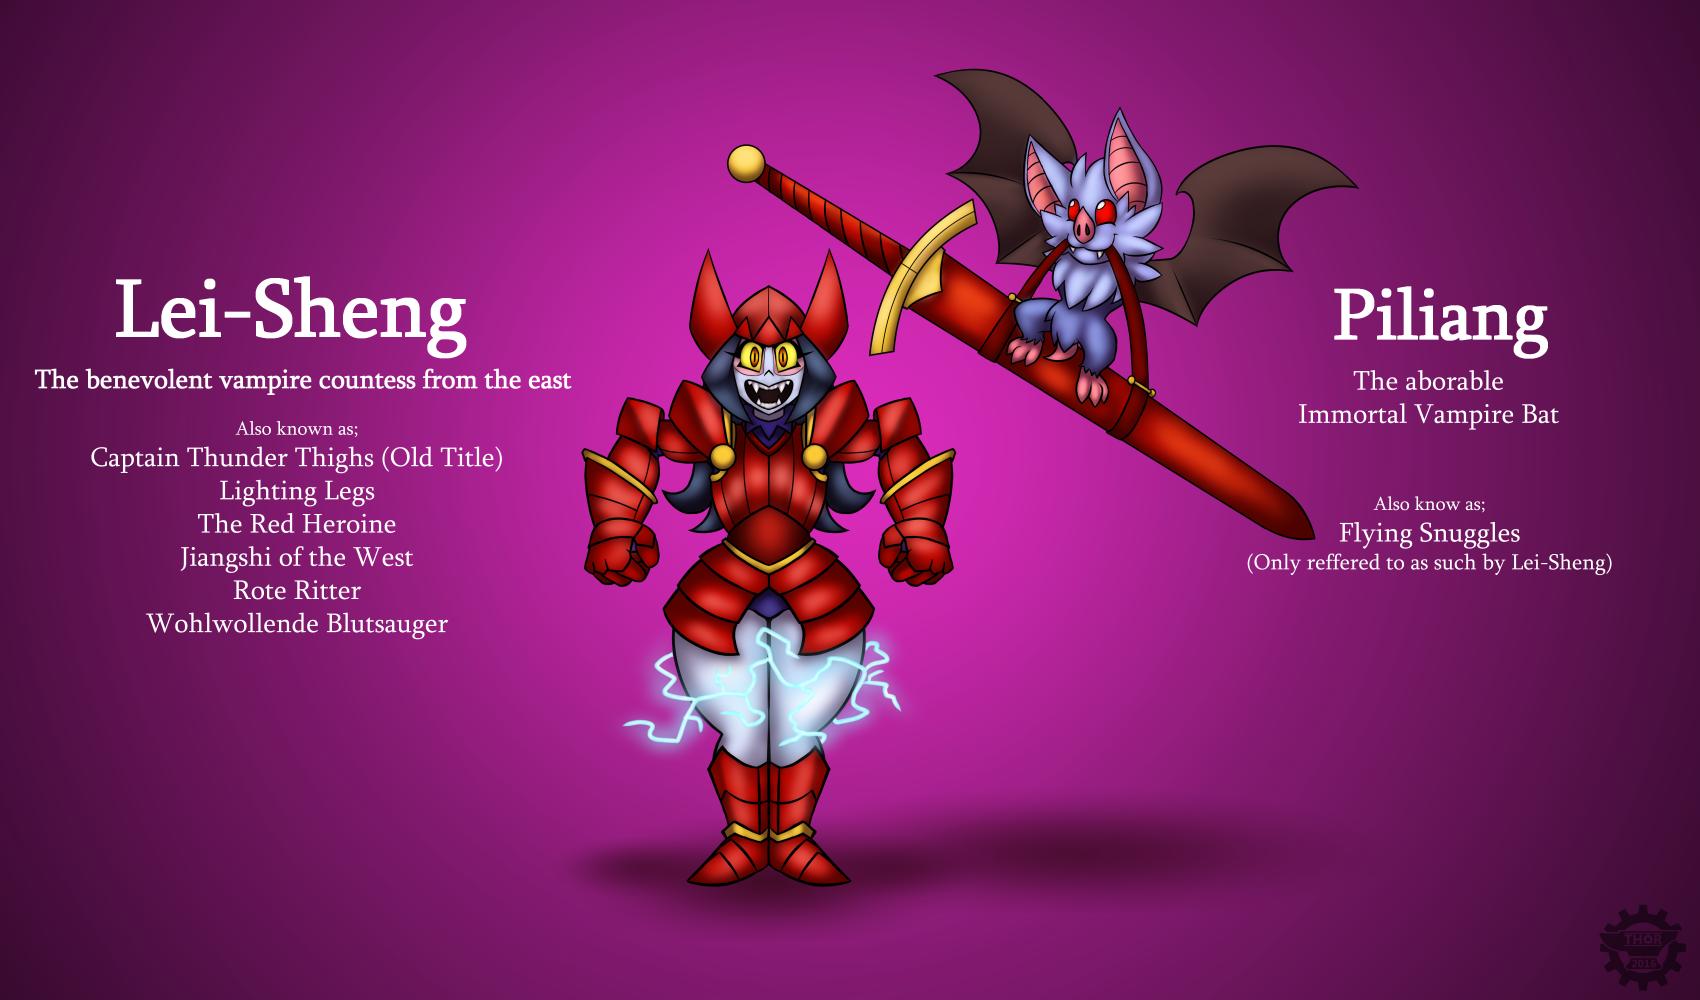 Lei-Sheng the Benevolent